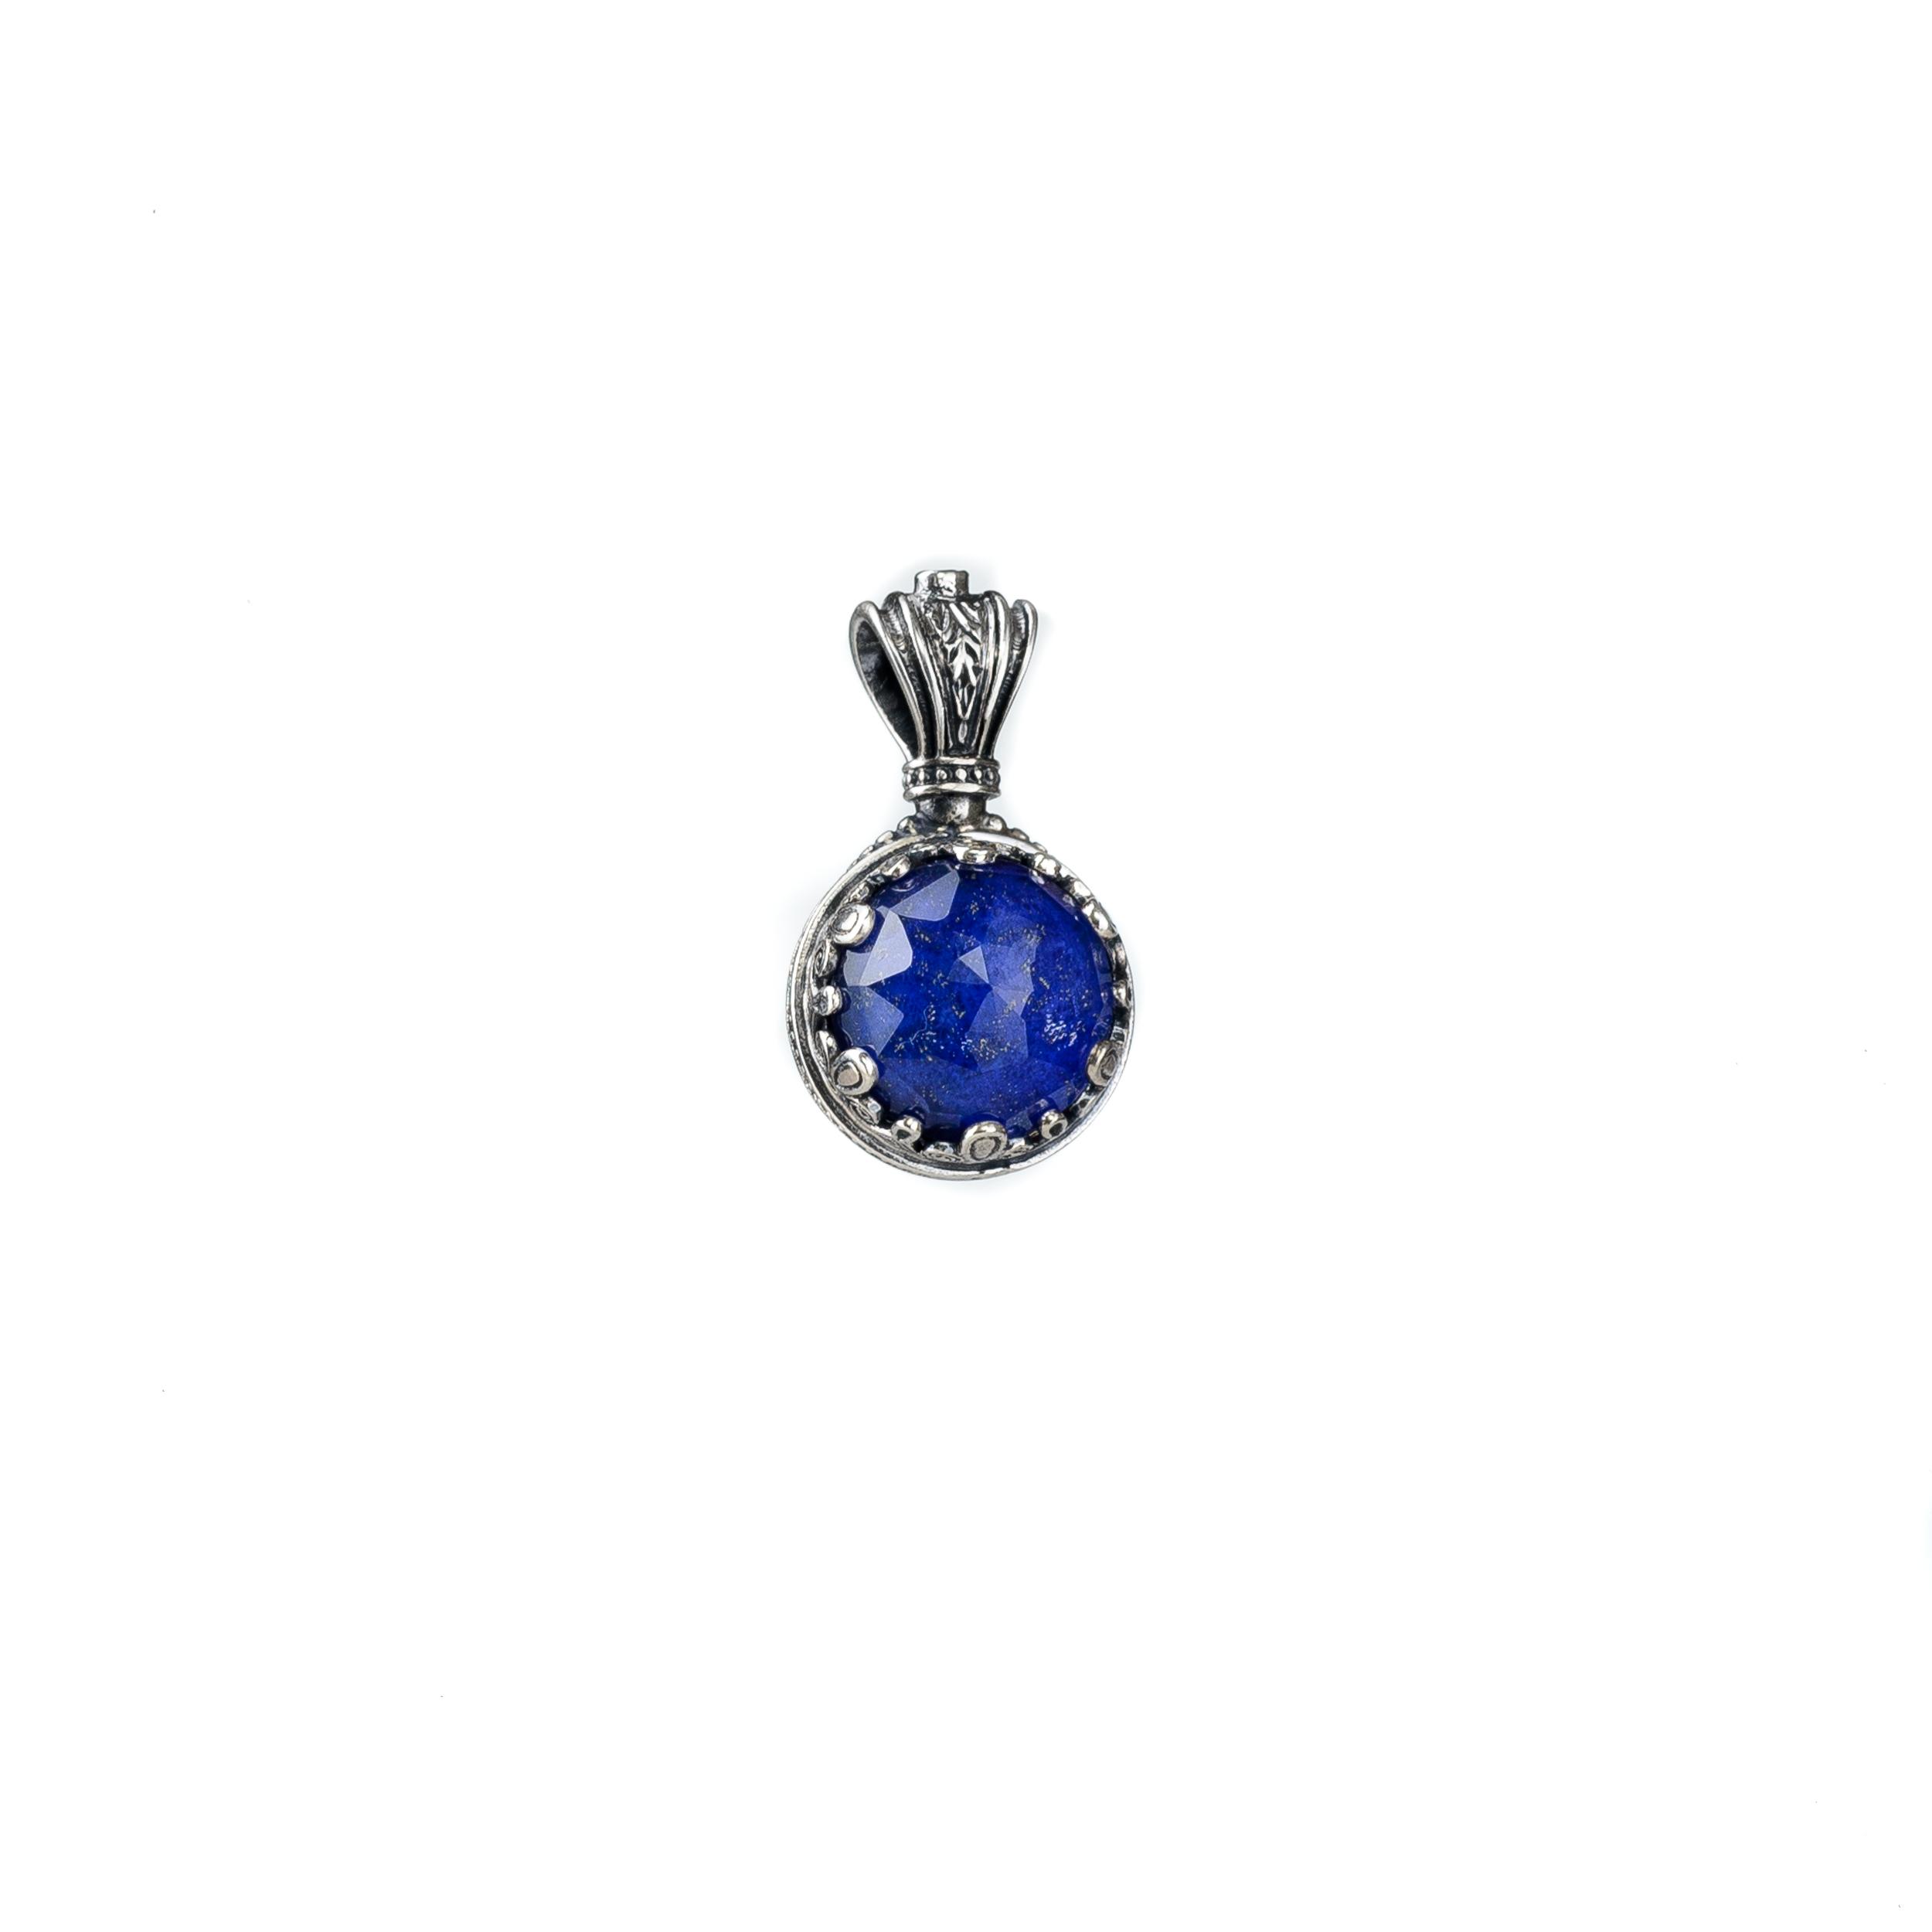 Silver, Gerochristo, handmade pendant with Azourite stone.